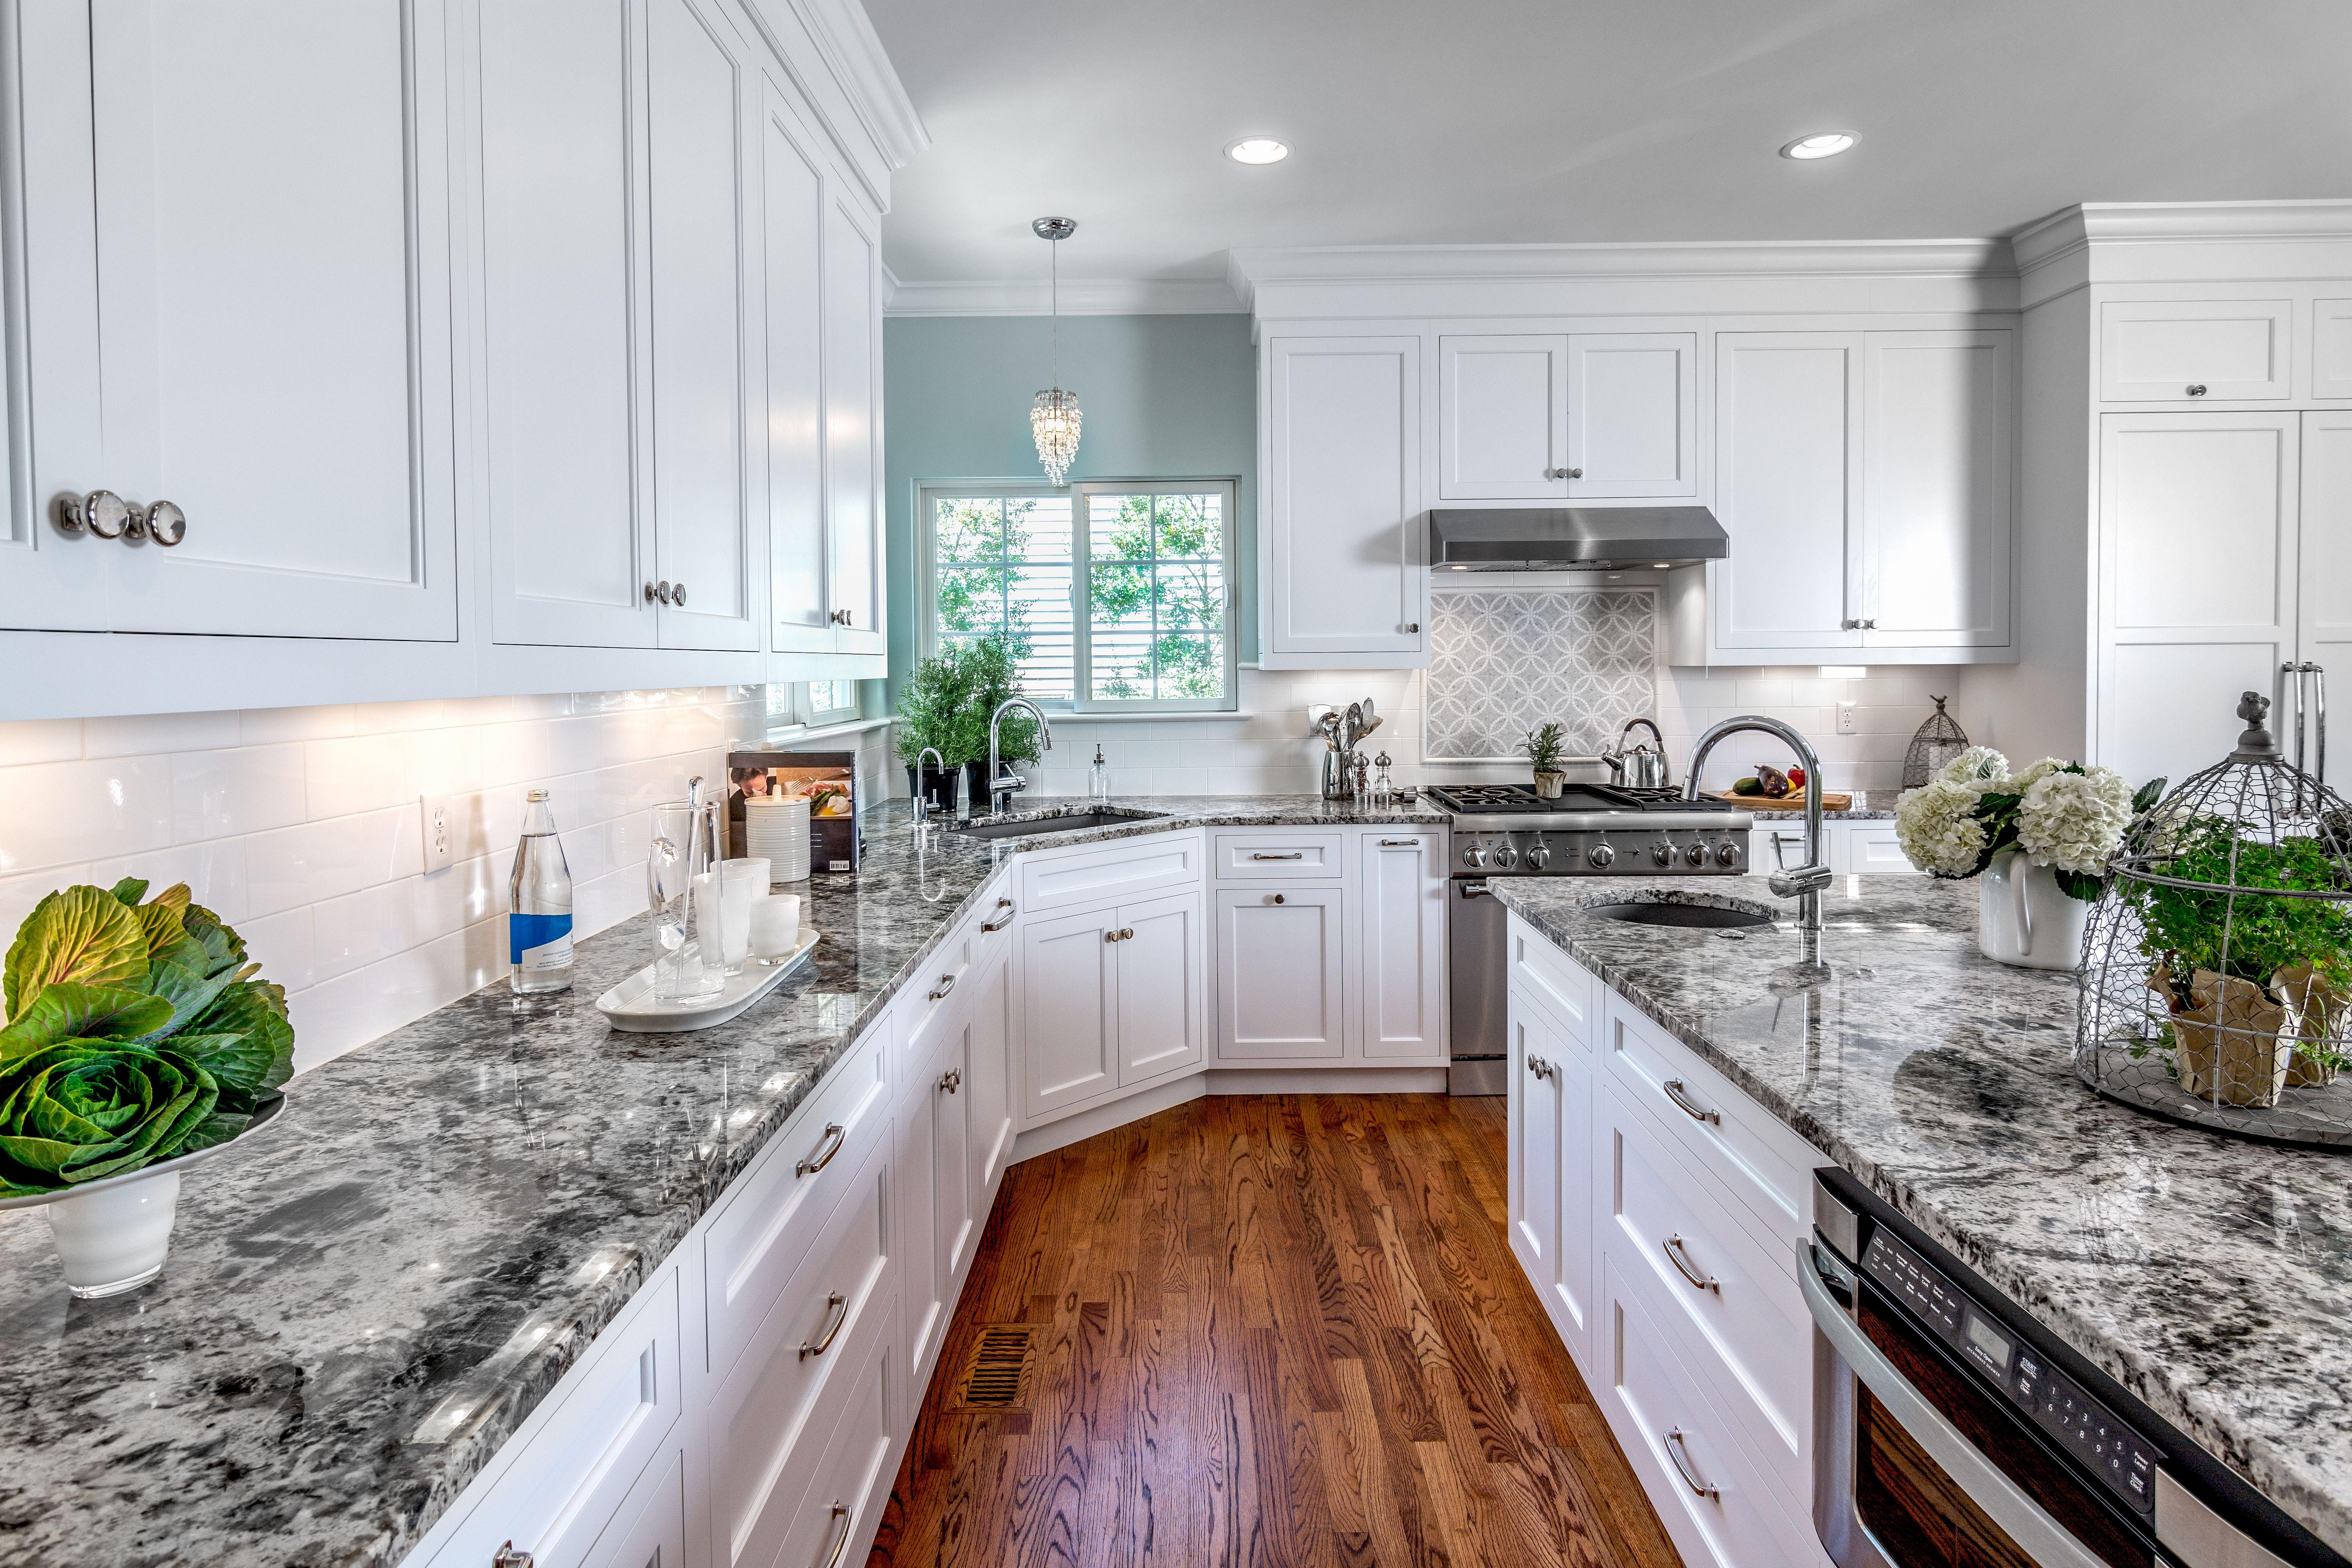 Plato 20kitchen 2019 20 U2013 20plato 20woodwork Kitchen Tiles Design Traditional Kitchen Cabinets Kitchen Design Decor